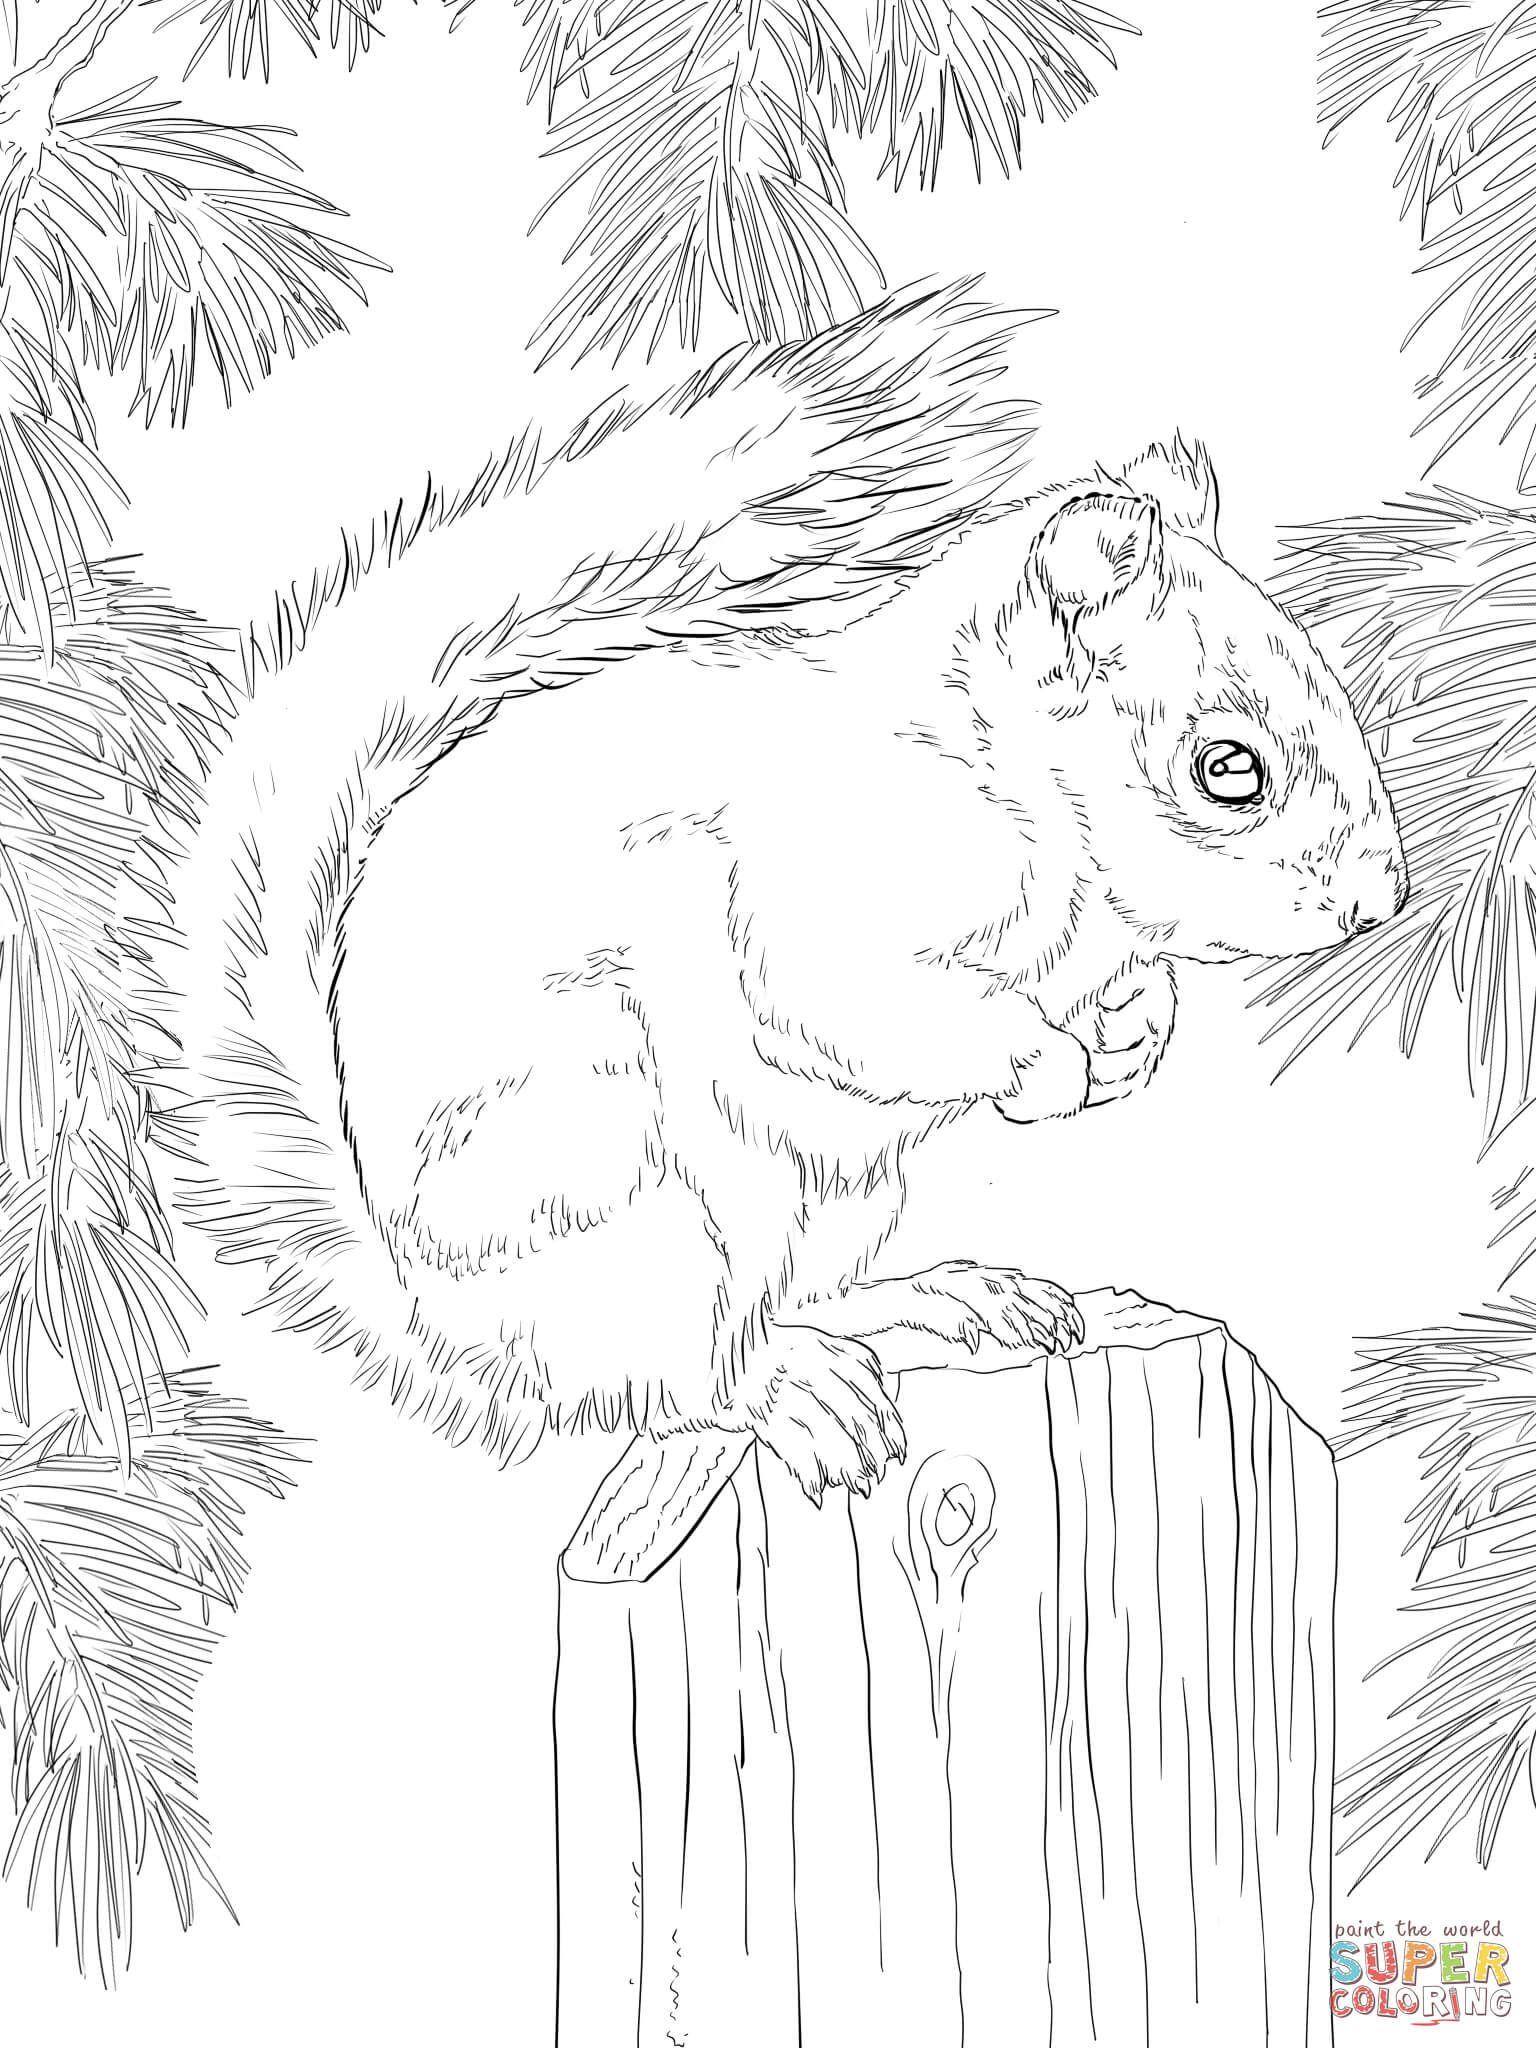 American Red Squirrel Super Coloring Squirrel Coloring Page Animal Coloring Pages Coloring Book Art [ 2048 x 1536 Pixel ]